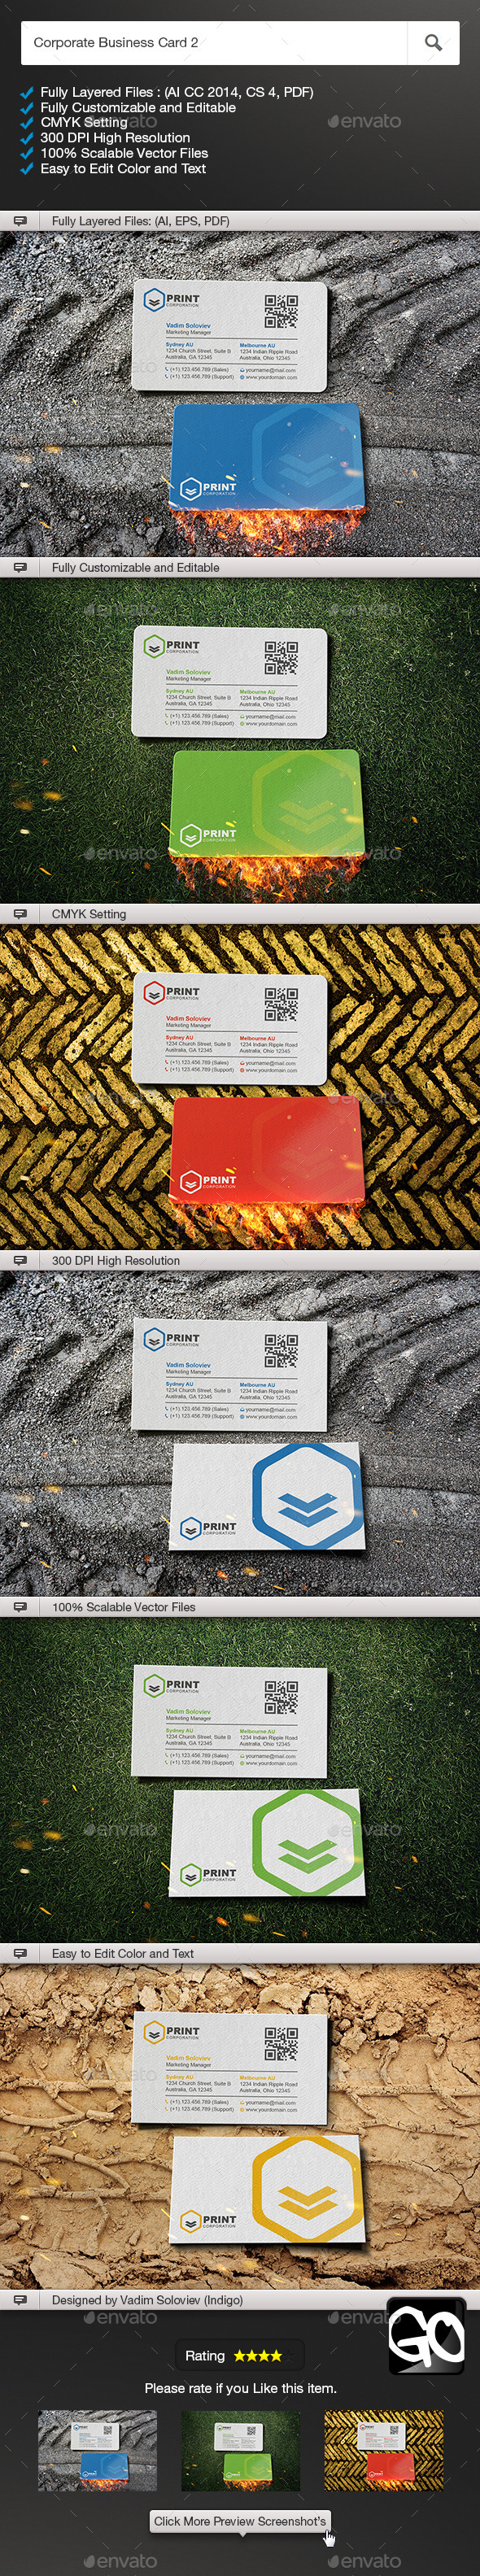 Corporate Business Card 2 - Corporate Business Cards